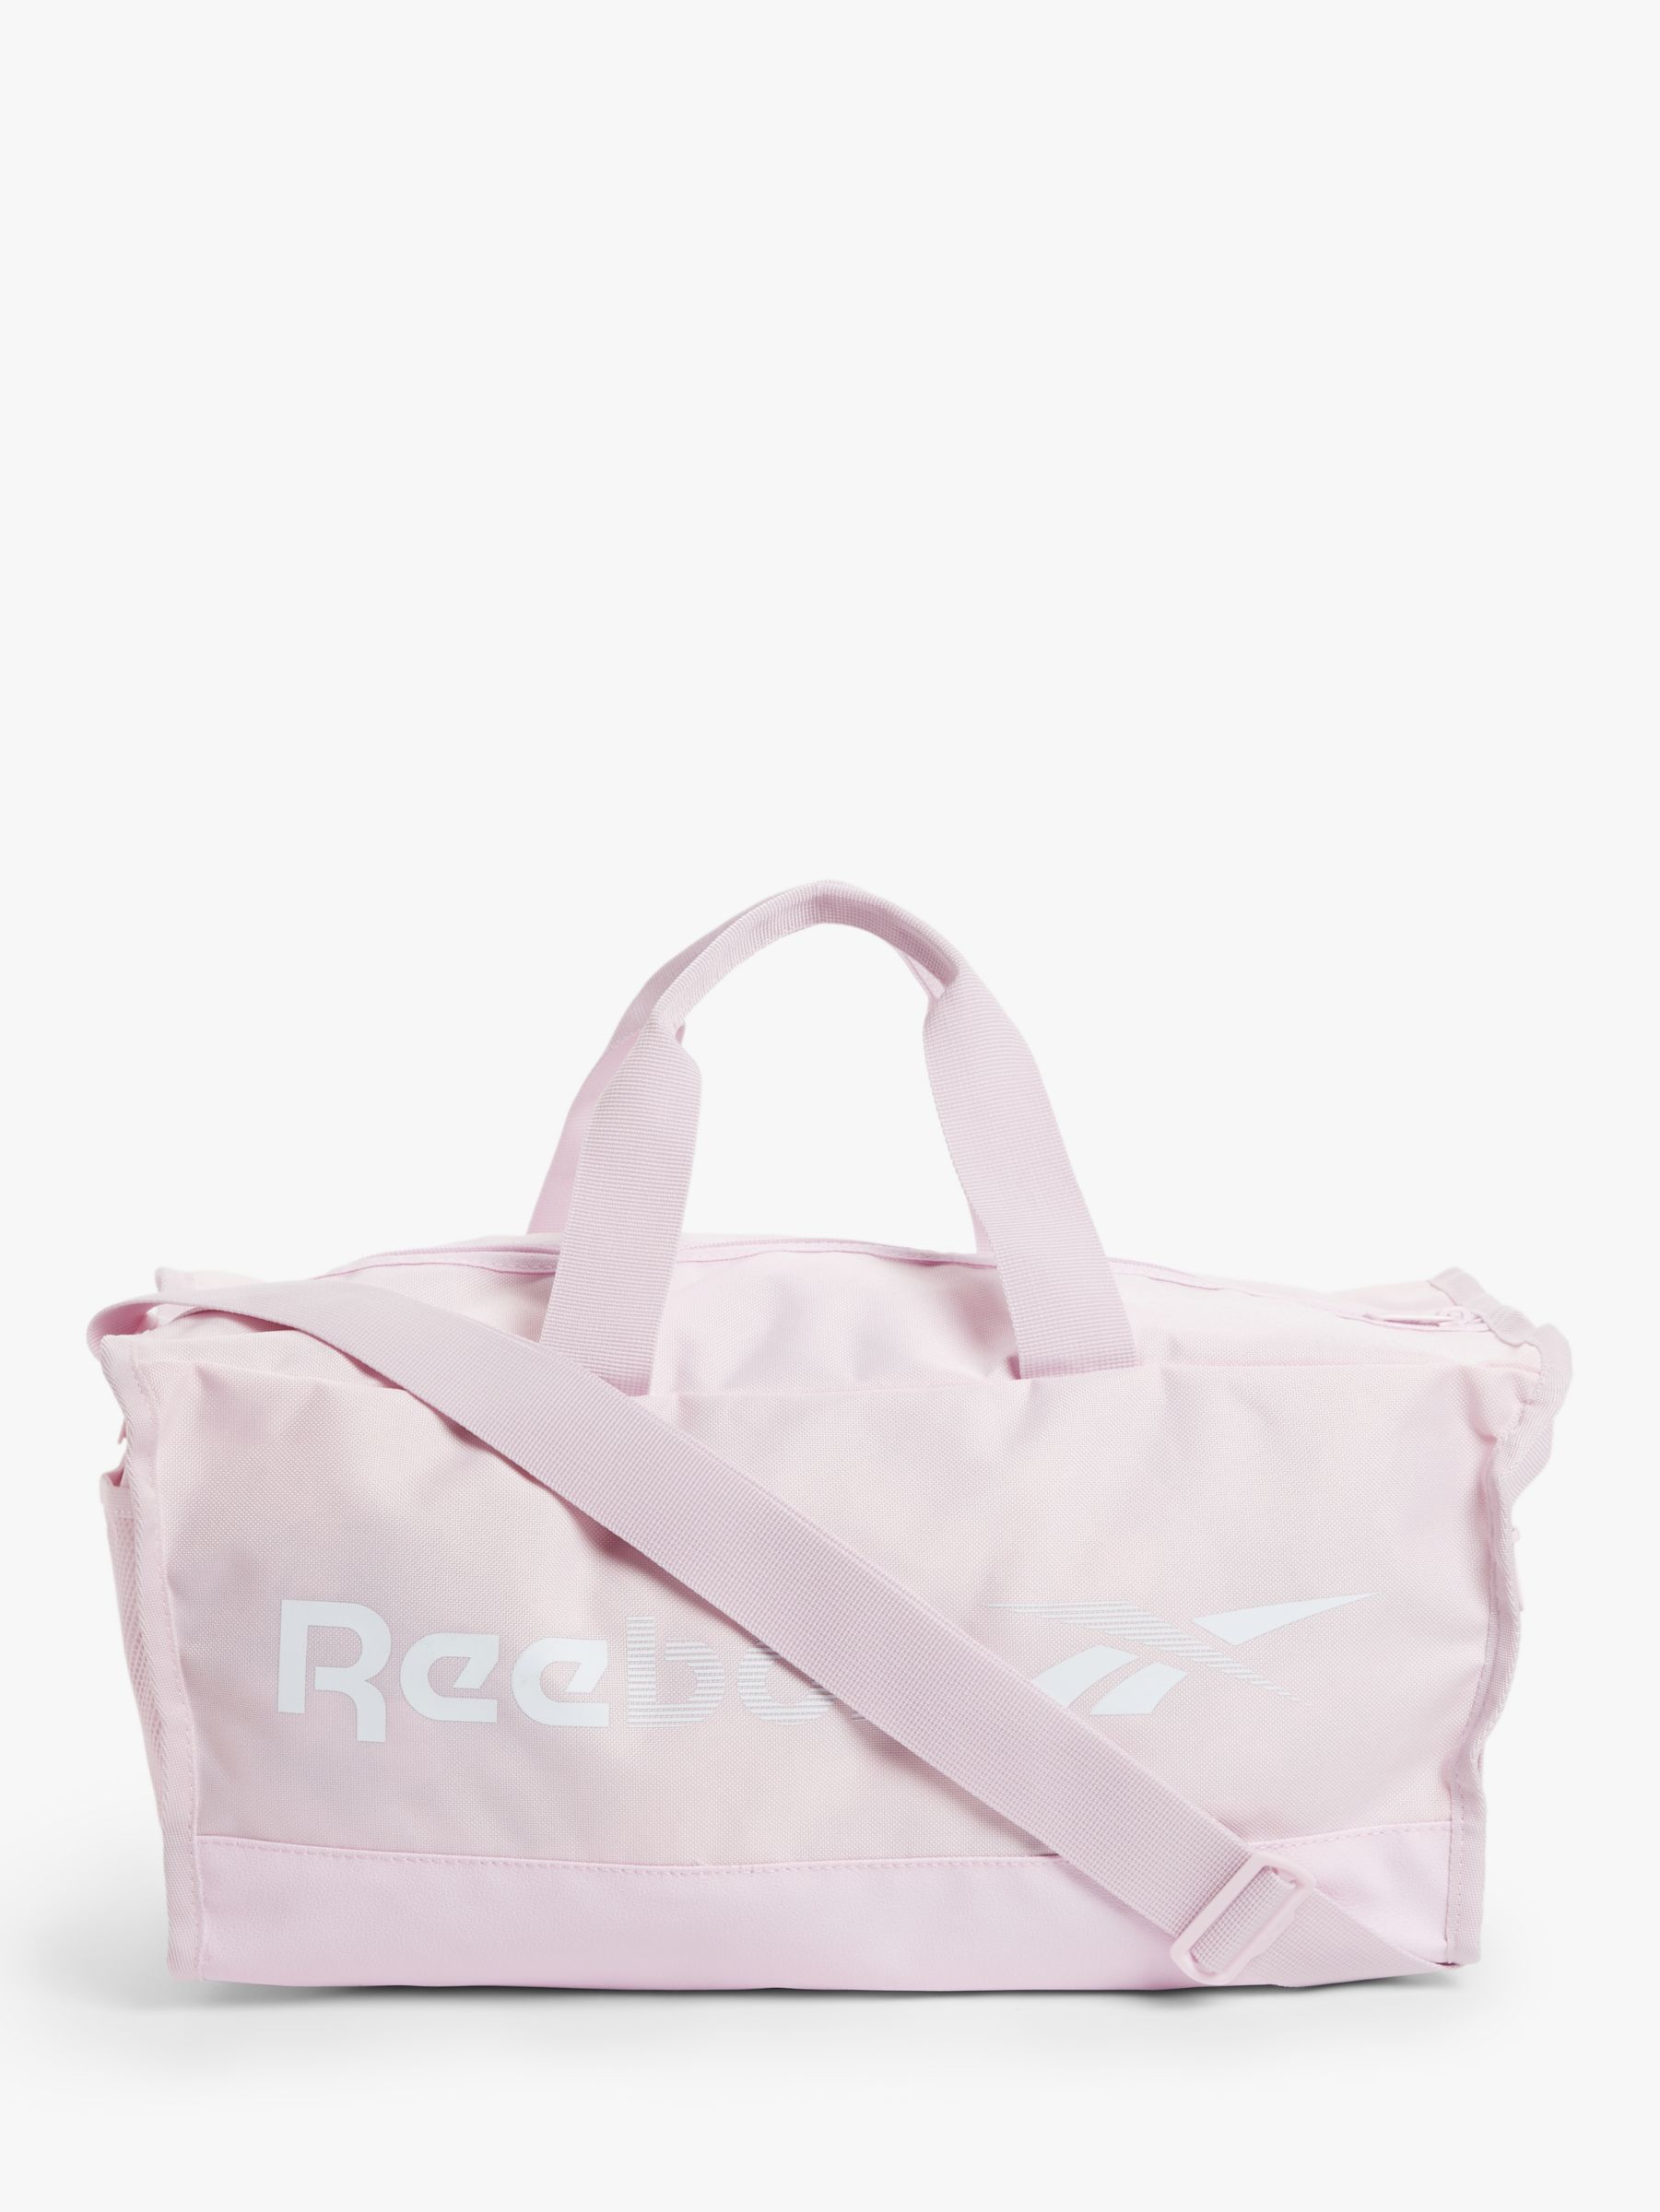 Reebok Reebok Training Essentials Small Grip Duffle Bag, Pixel Pink